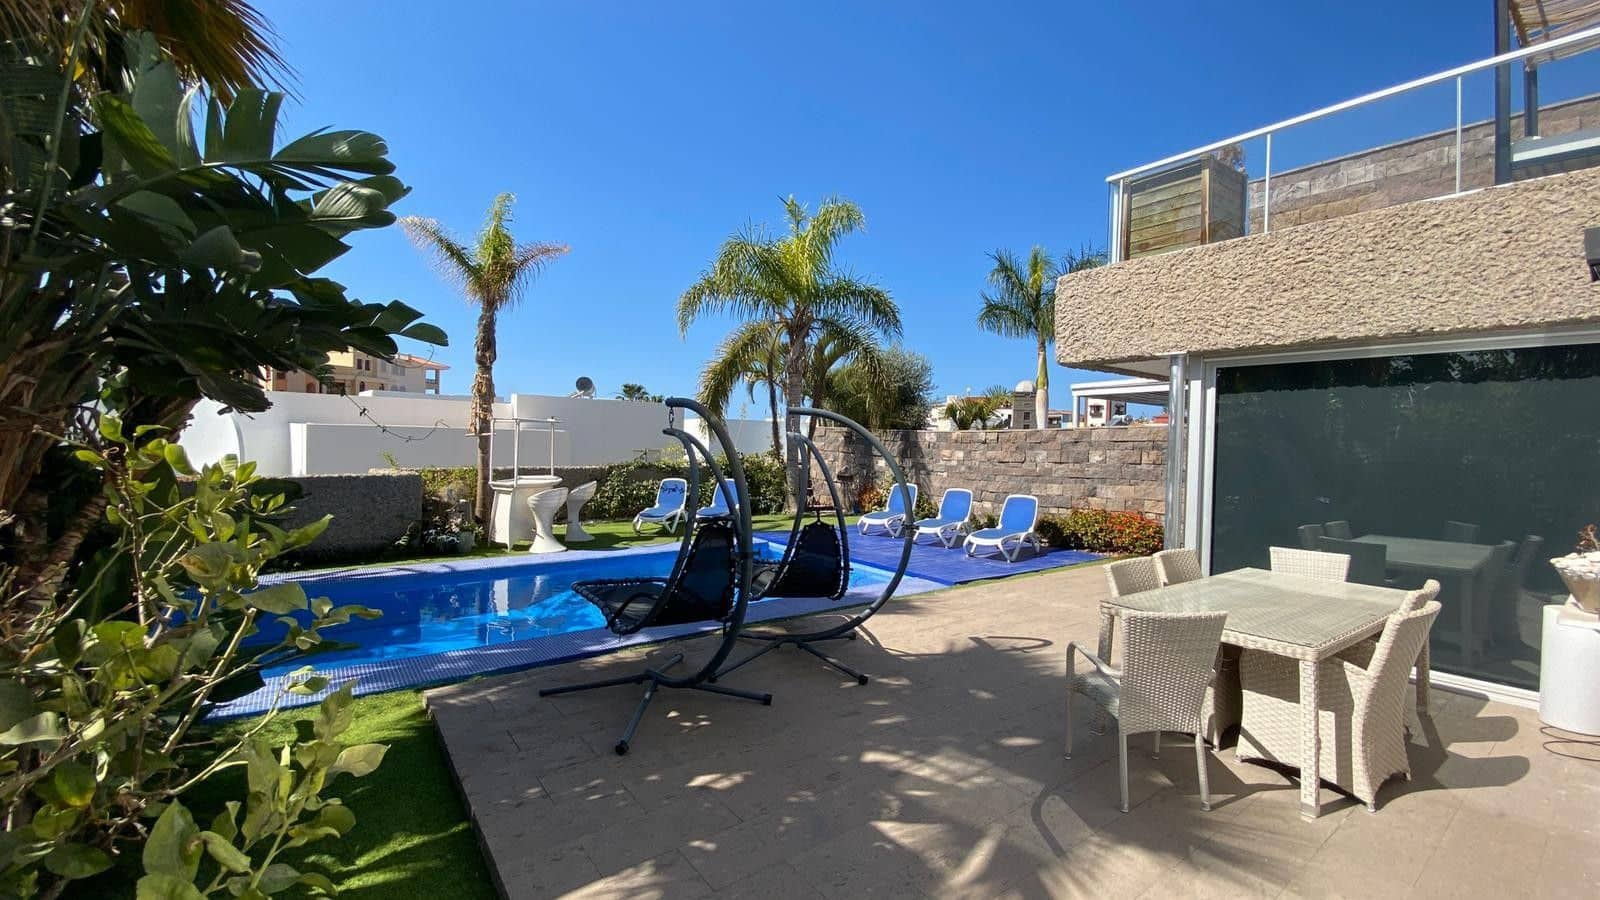 6 bedroom Villa for holiday rental in Costa Adeje with pool garage - € 2,700 (Ref: 5329191)